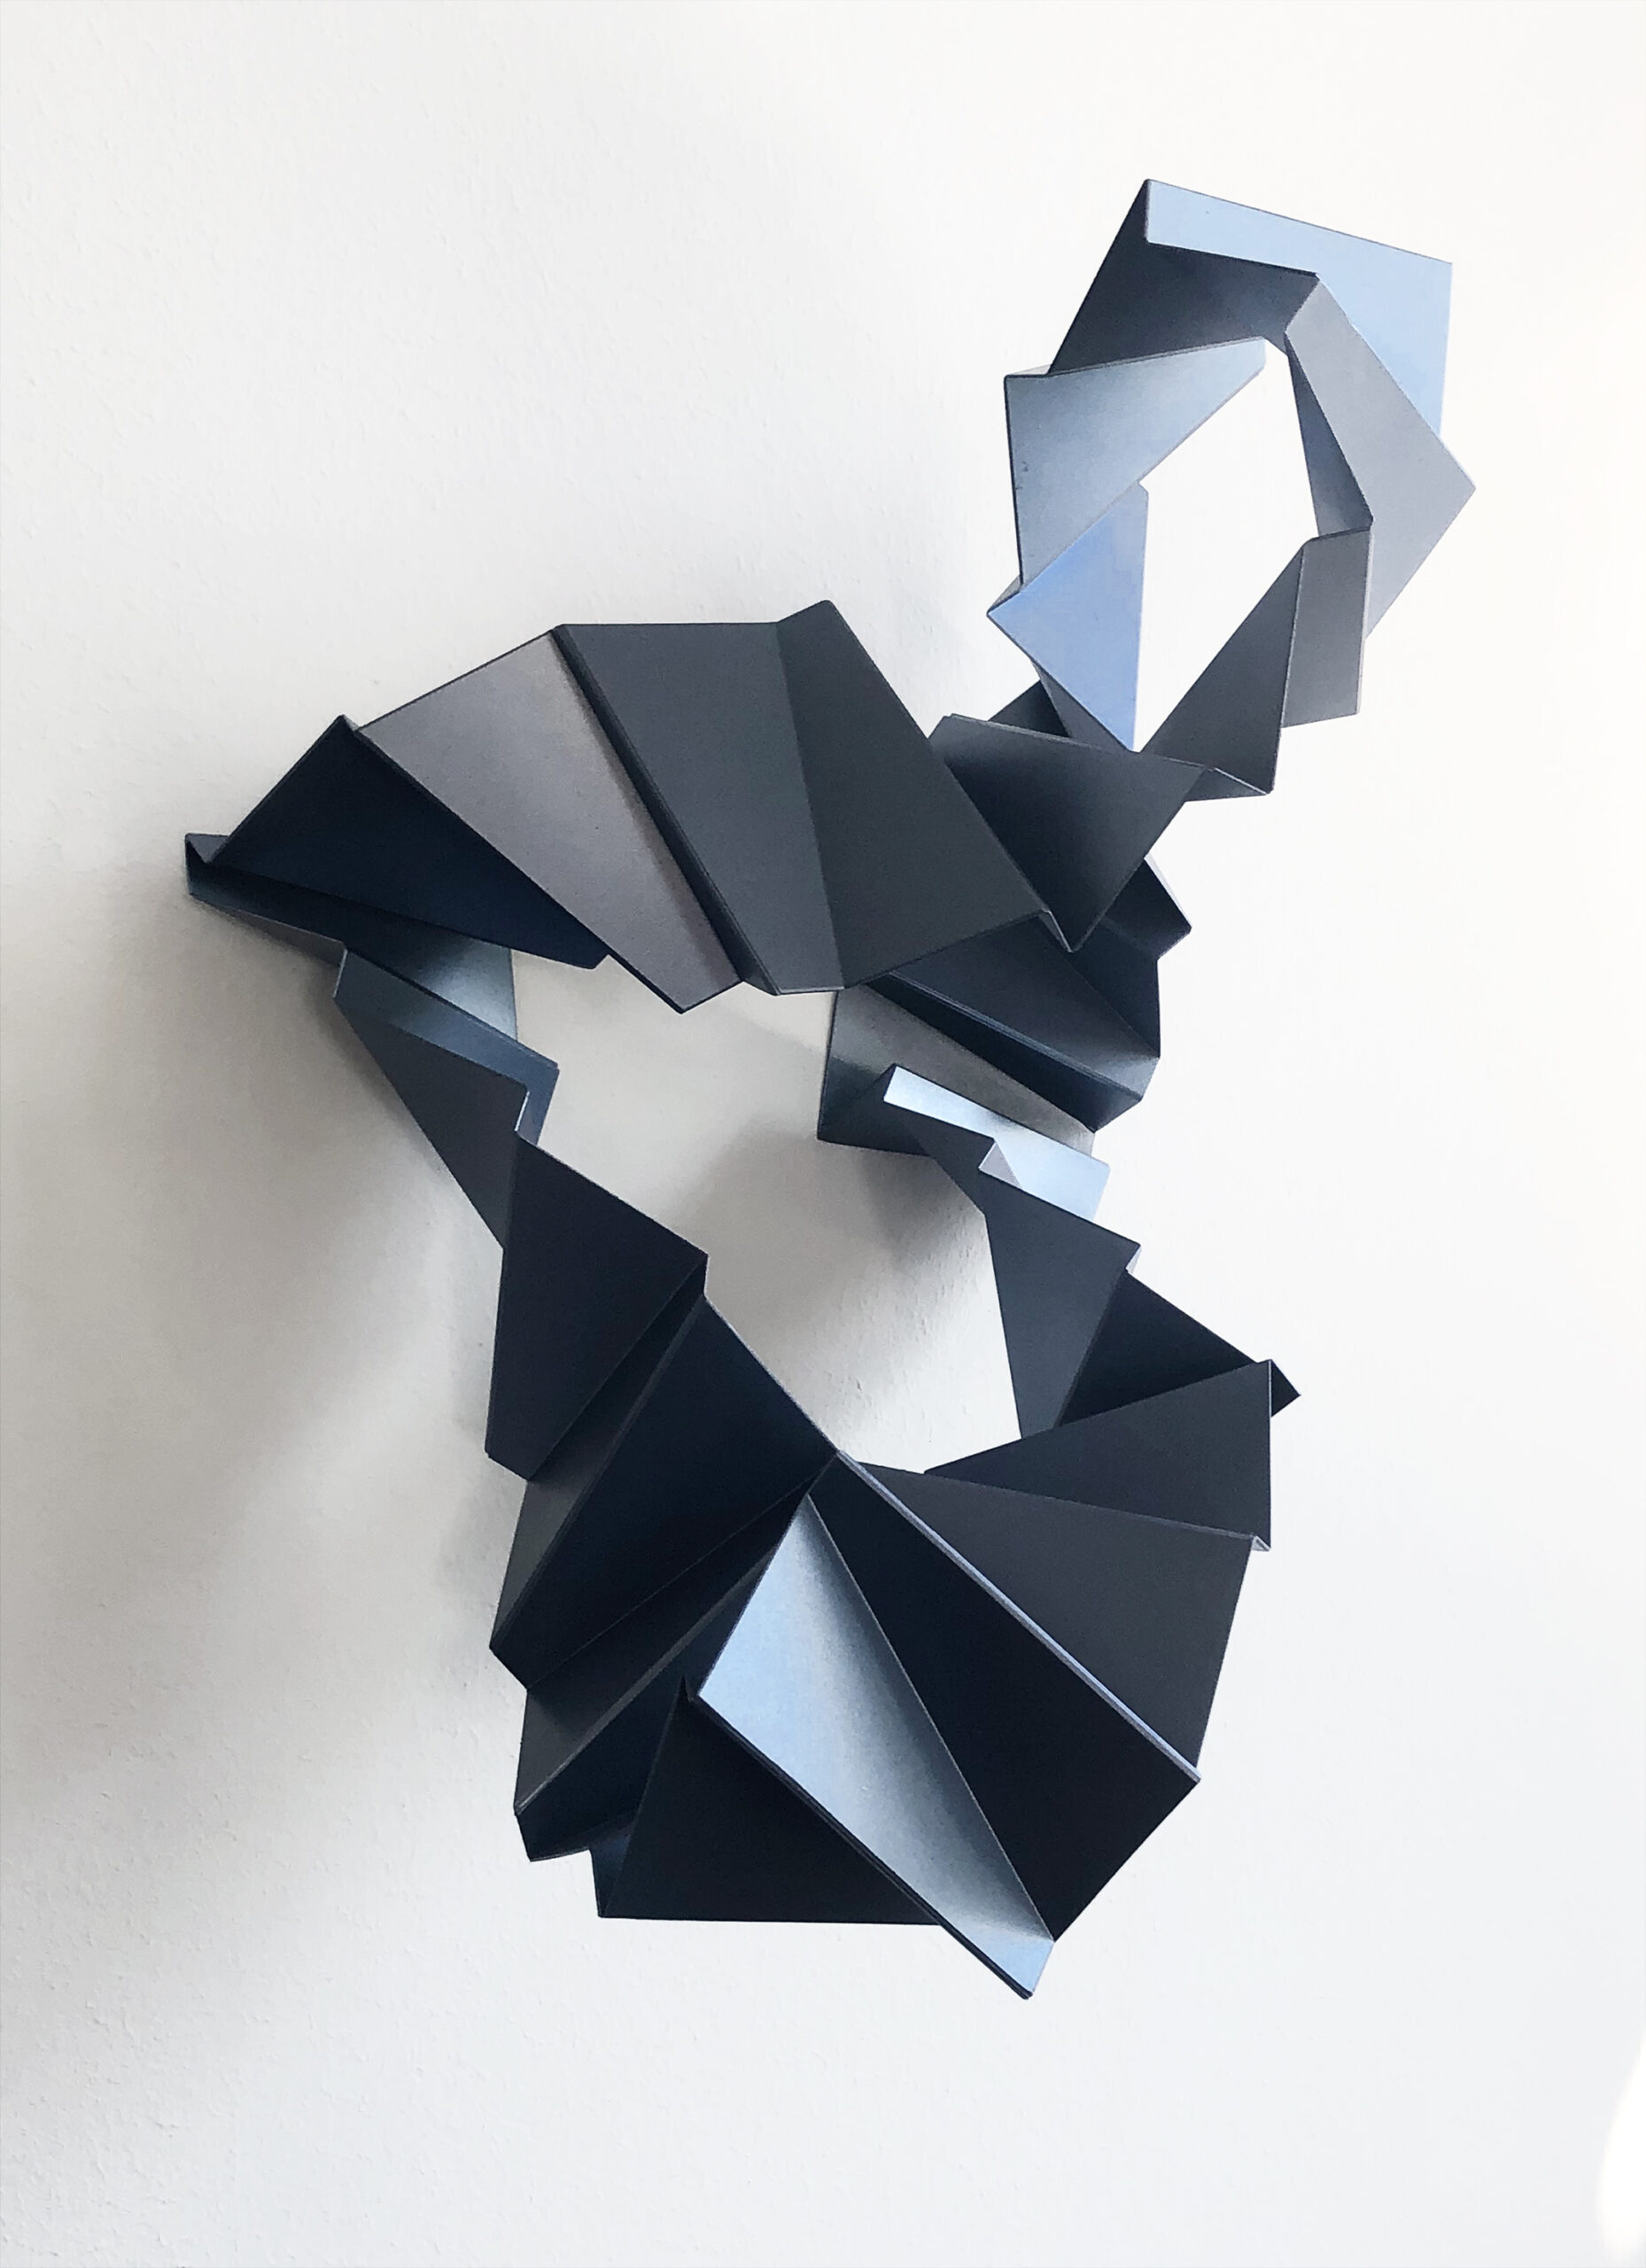 Dolce Vita – Gruppenausstellung